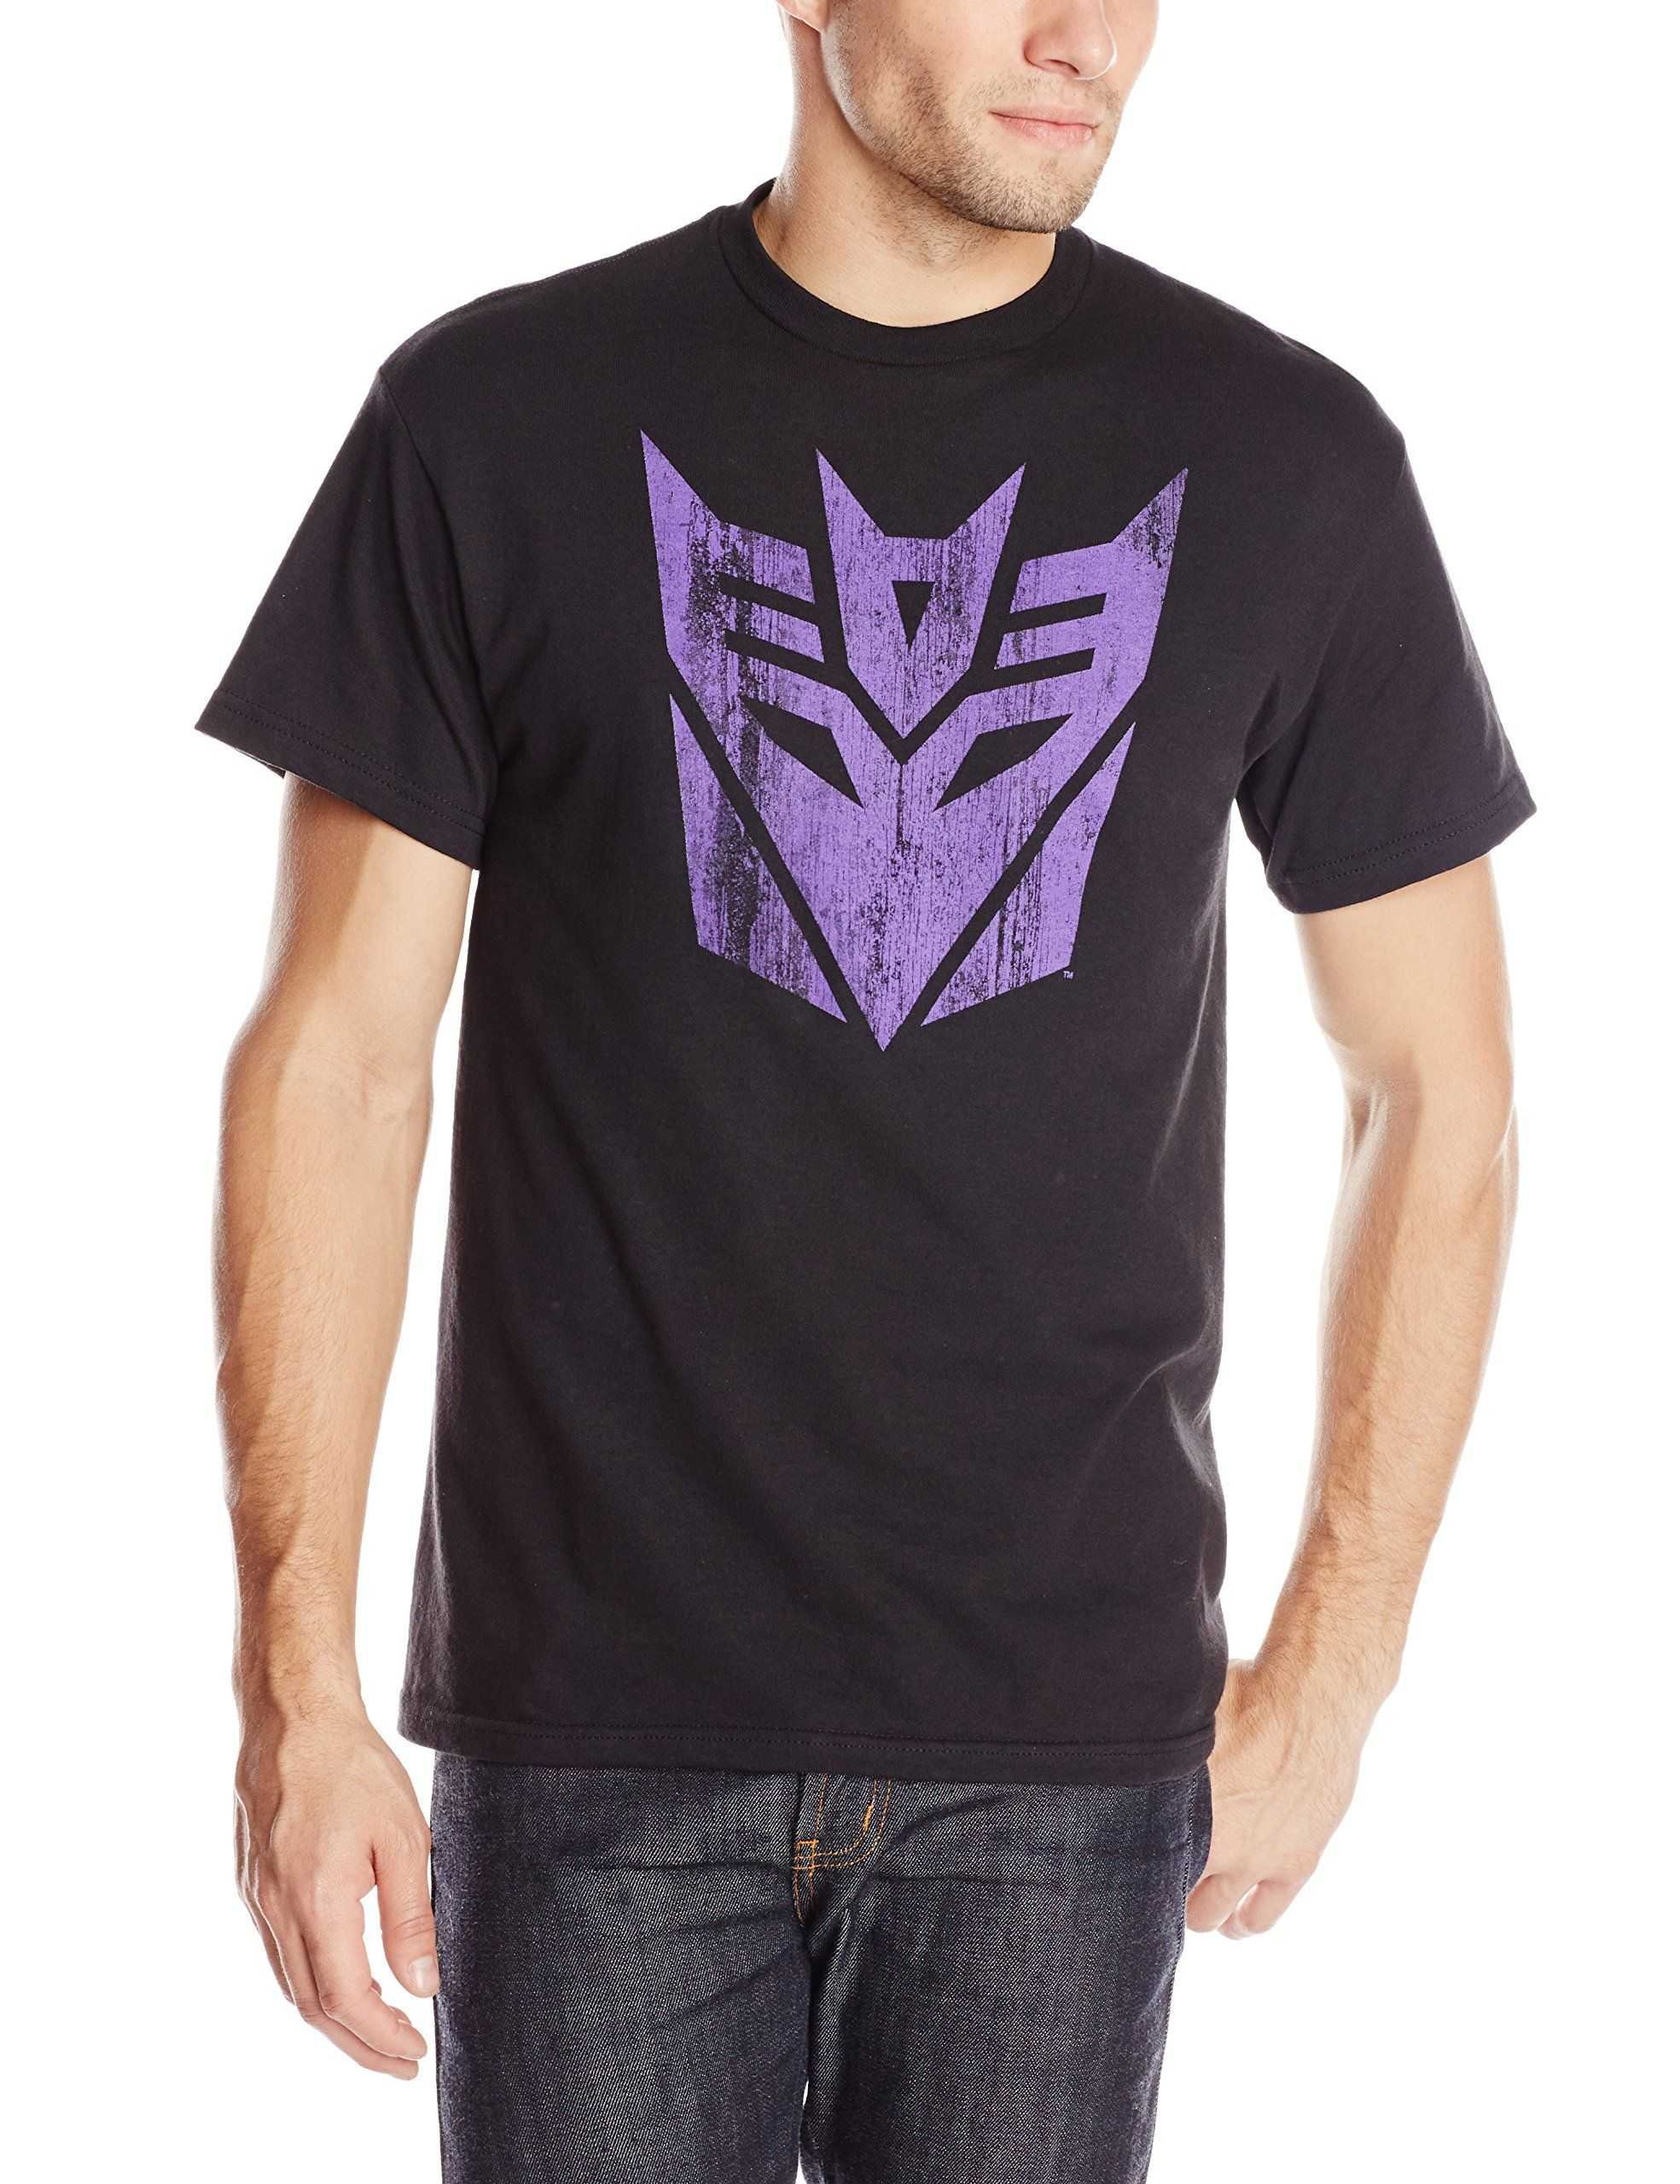 Transformers T-Shirt Decepticon Logo Black Tee